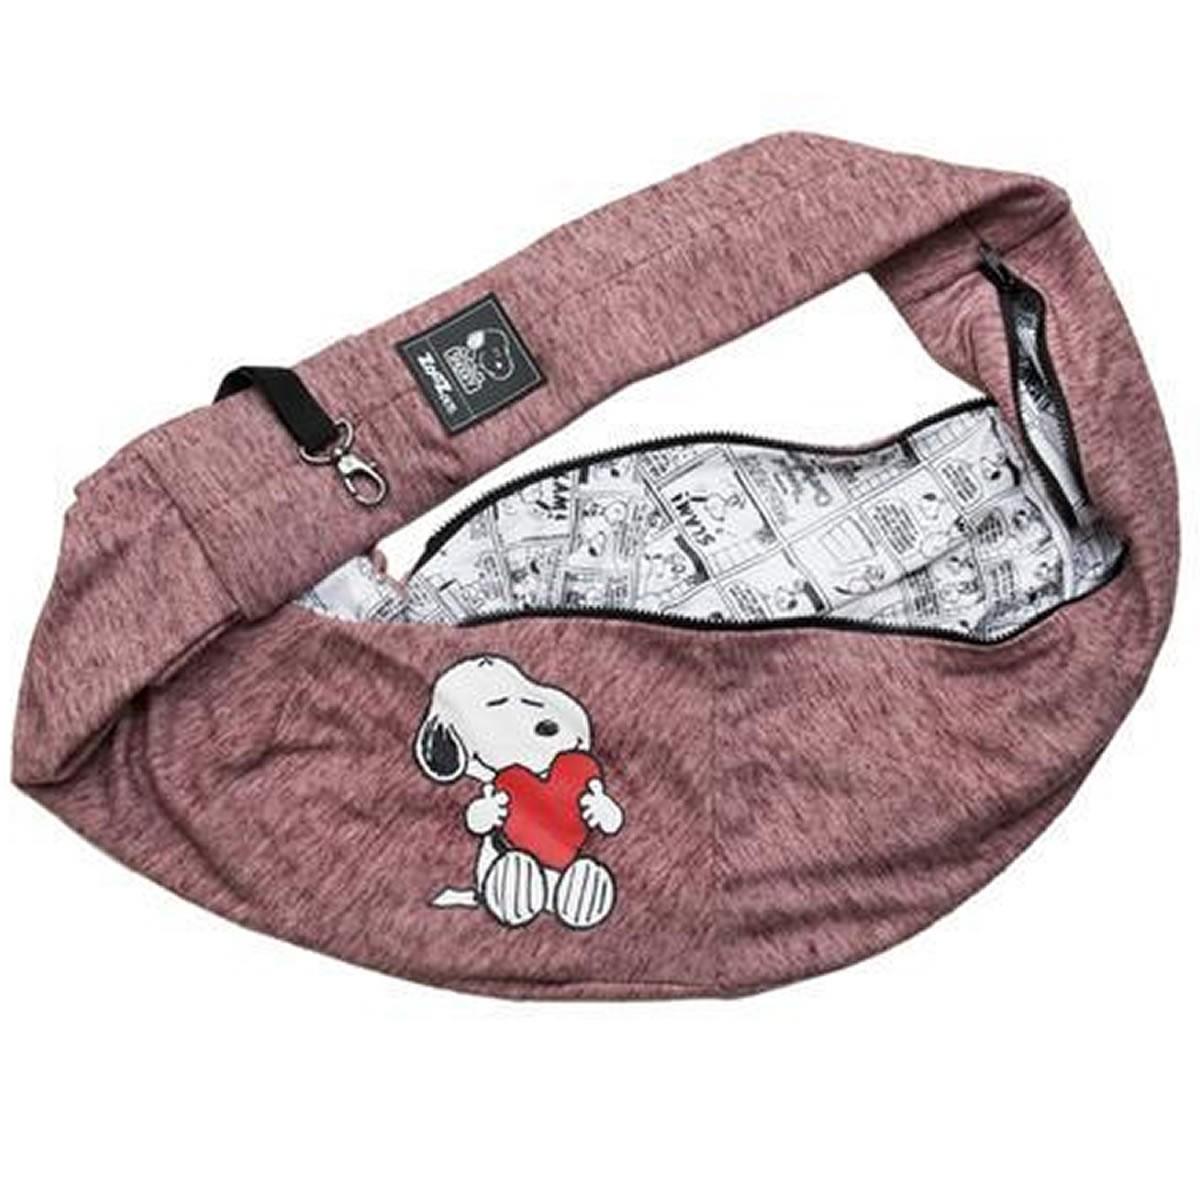 Bolsa de Transporte para Cachorro Sling Snoopy Presidente Zooz Petz Vermelho